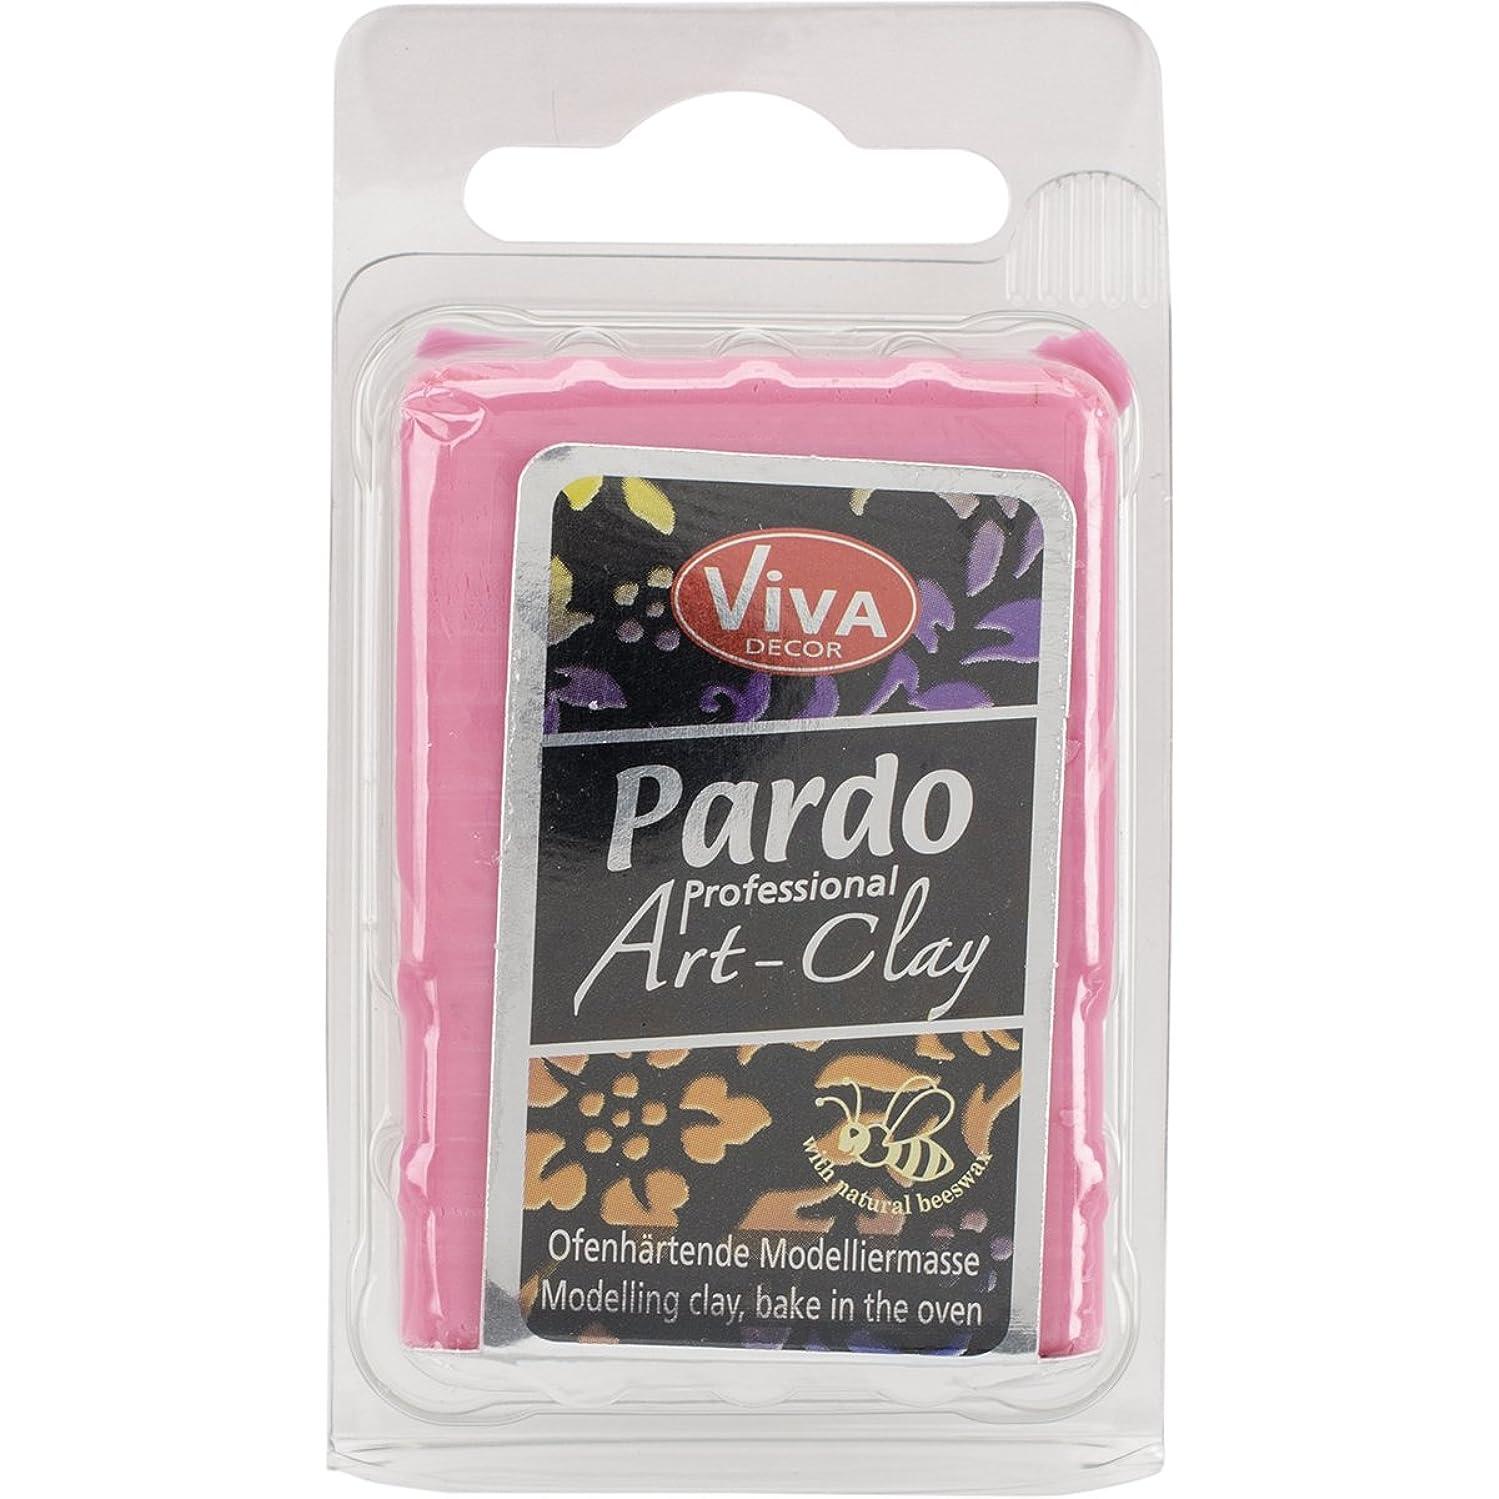 Viva Decor Pardo Art Clay Translucent, 56g, Red